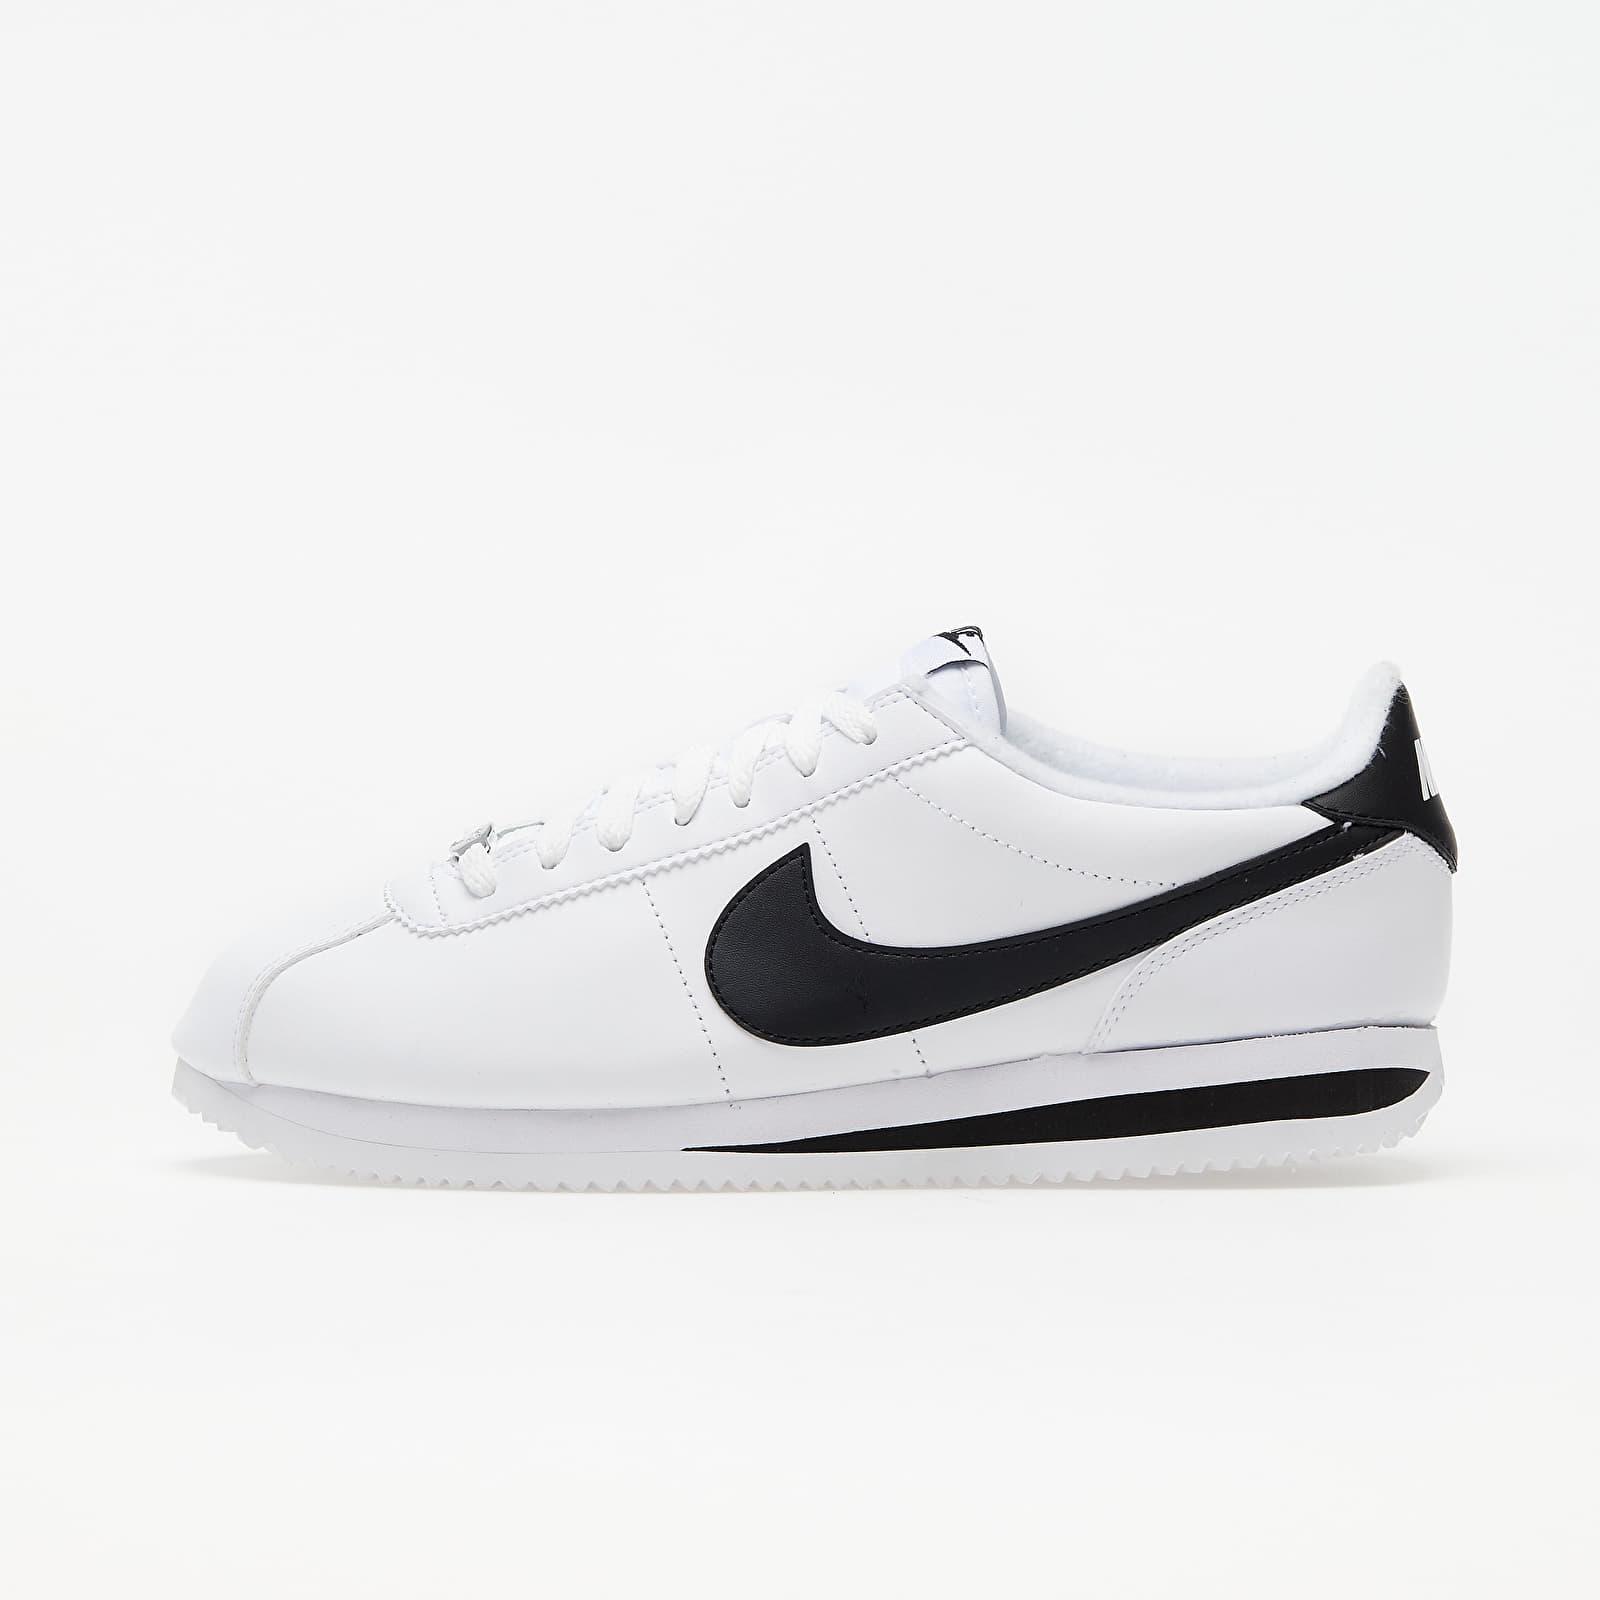 Zapatillas Hombre Nike Cortez Basic Leather White/ Black-Metallic Silver